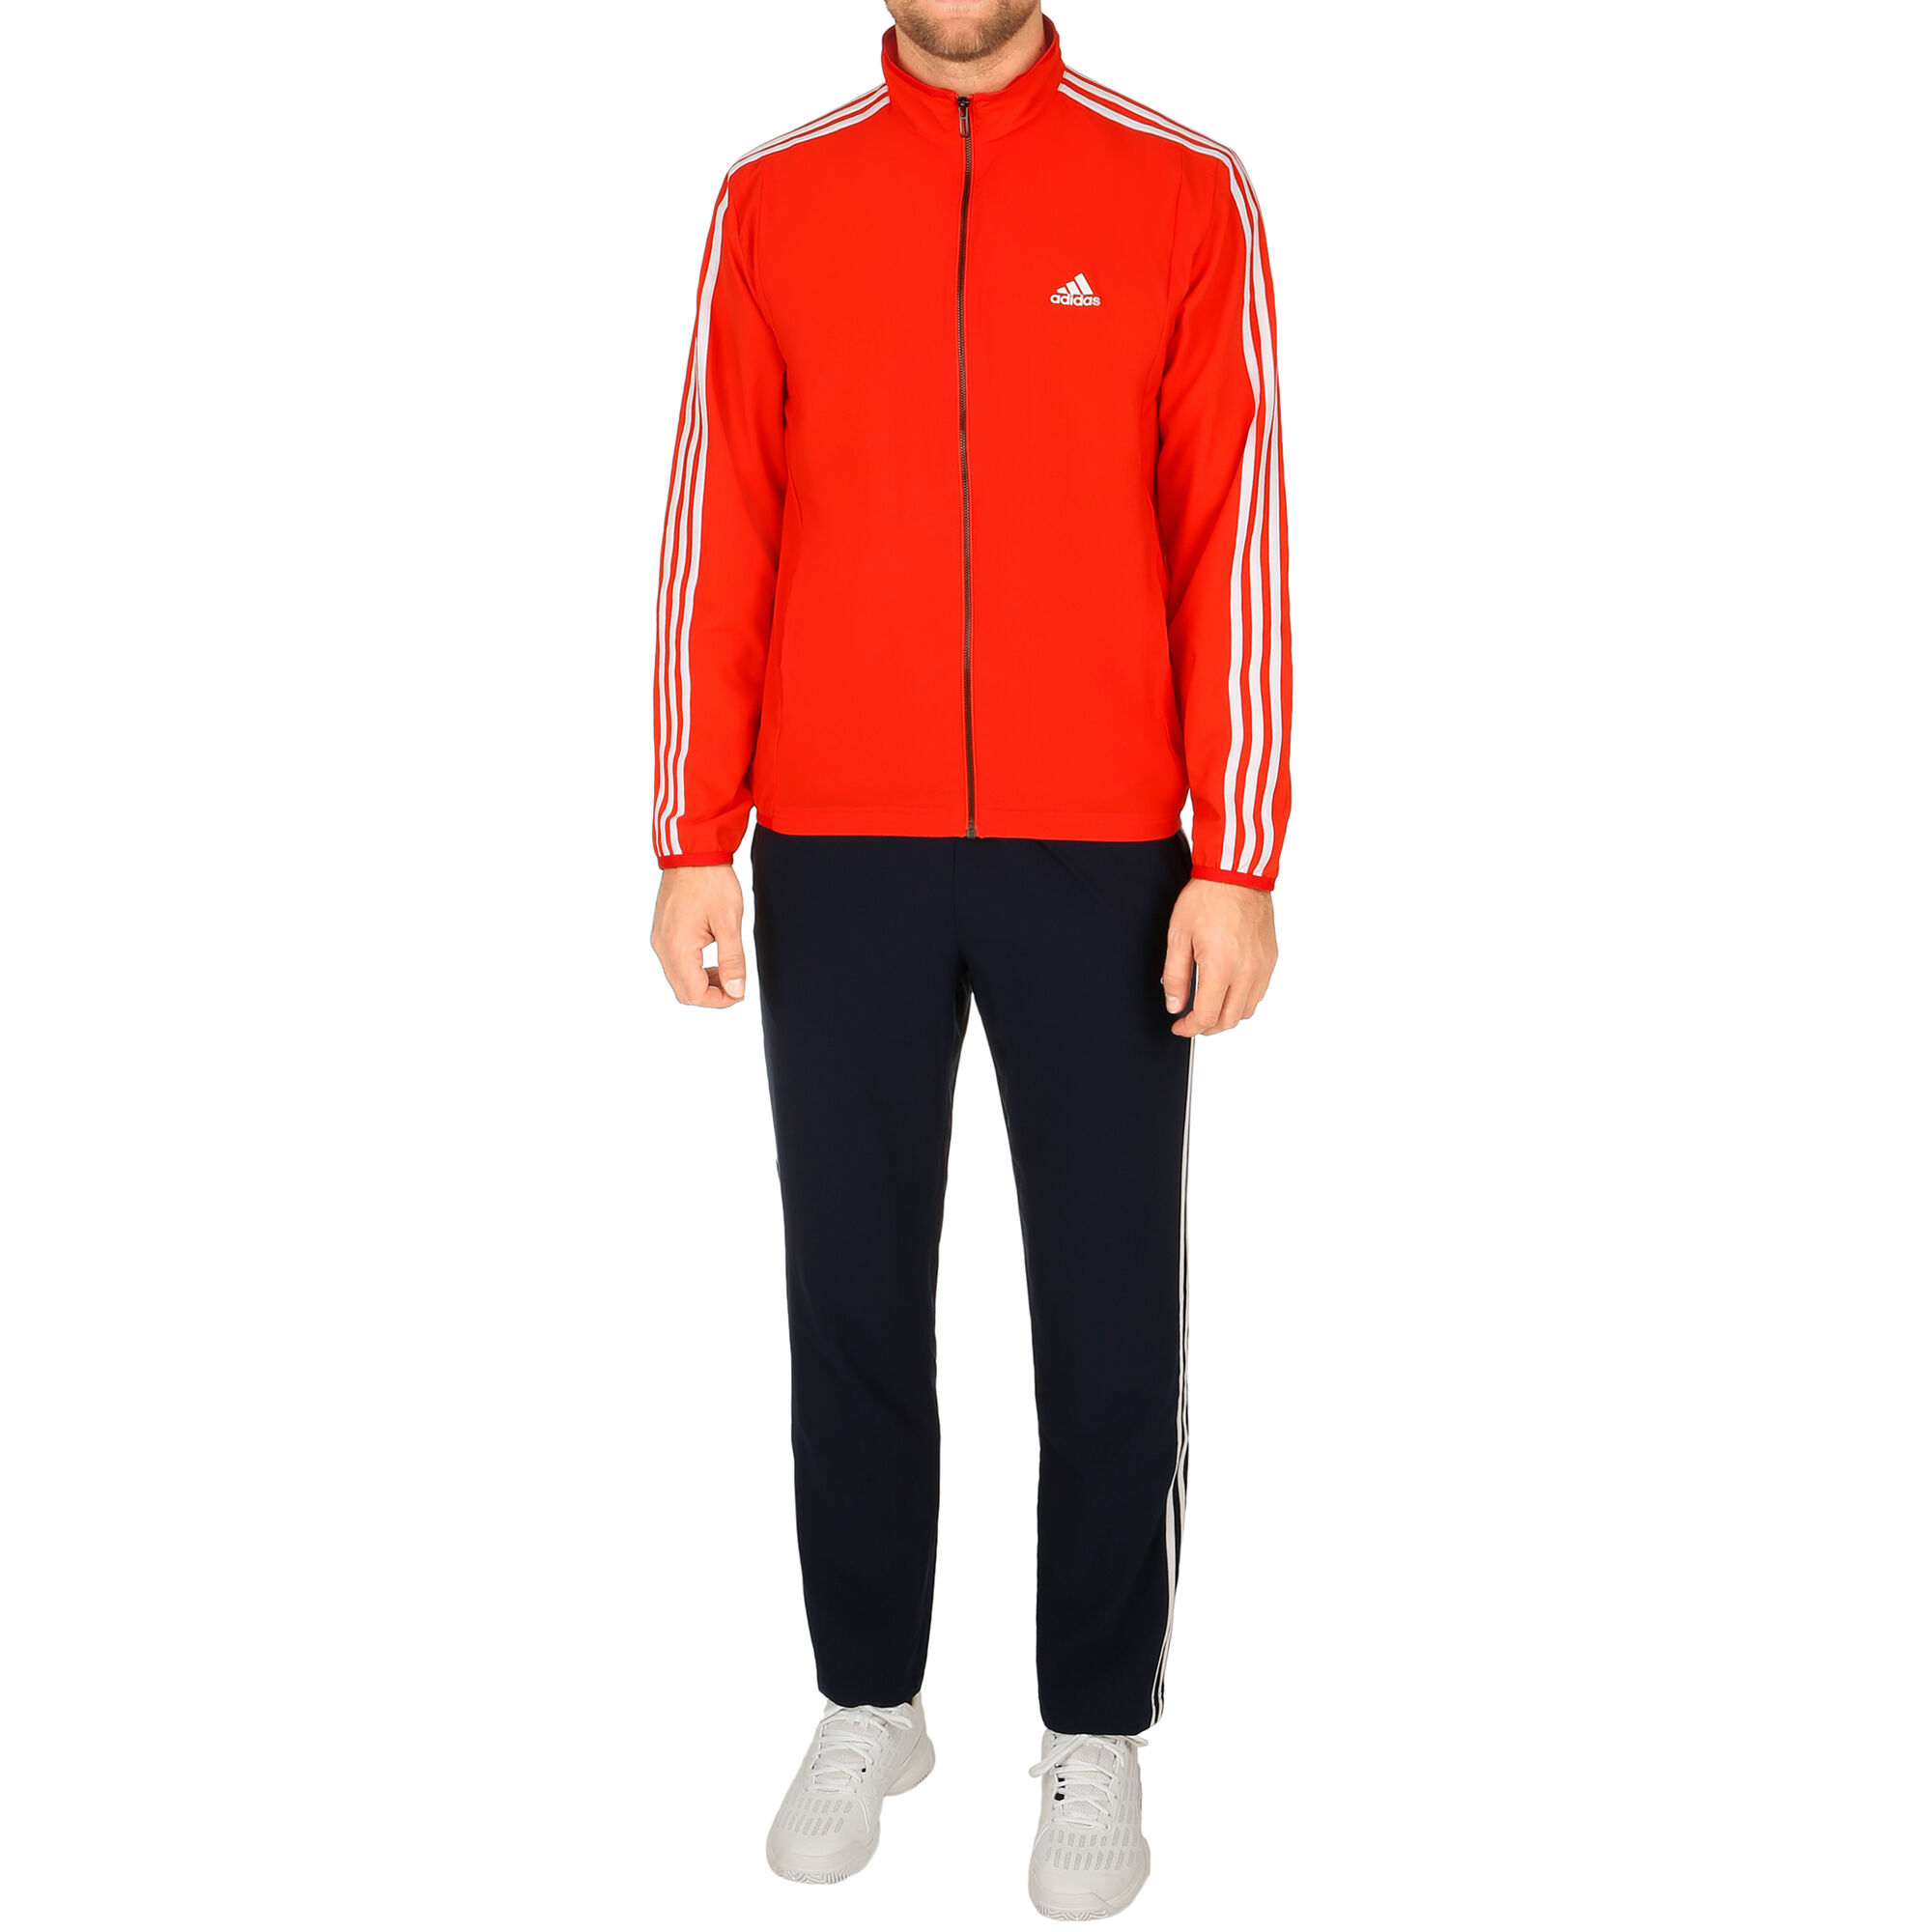 82f2f88707 adidas Woven Light Trainingsanzug Herren - Rot, Dunkelblau online ...